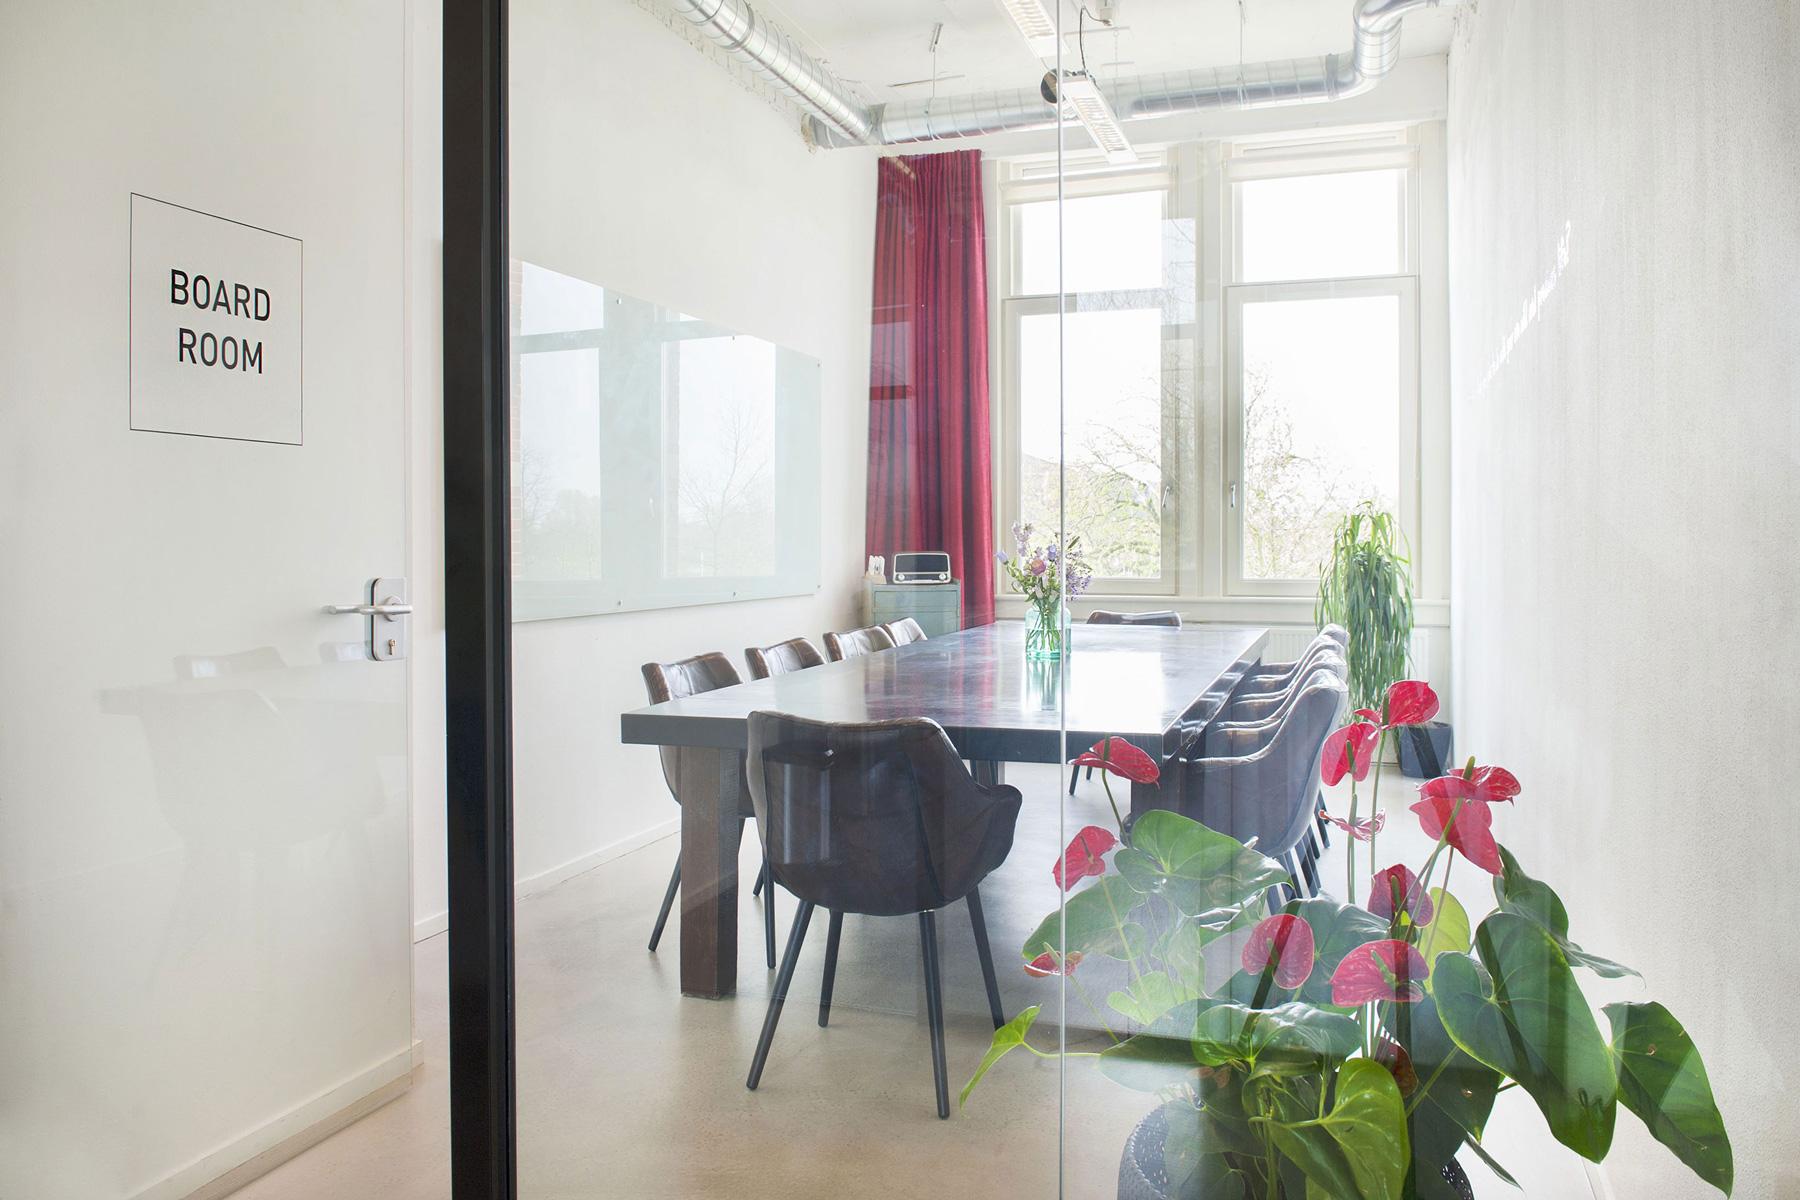 glass board room kantoor sharing team project impact hub amsterdam